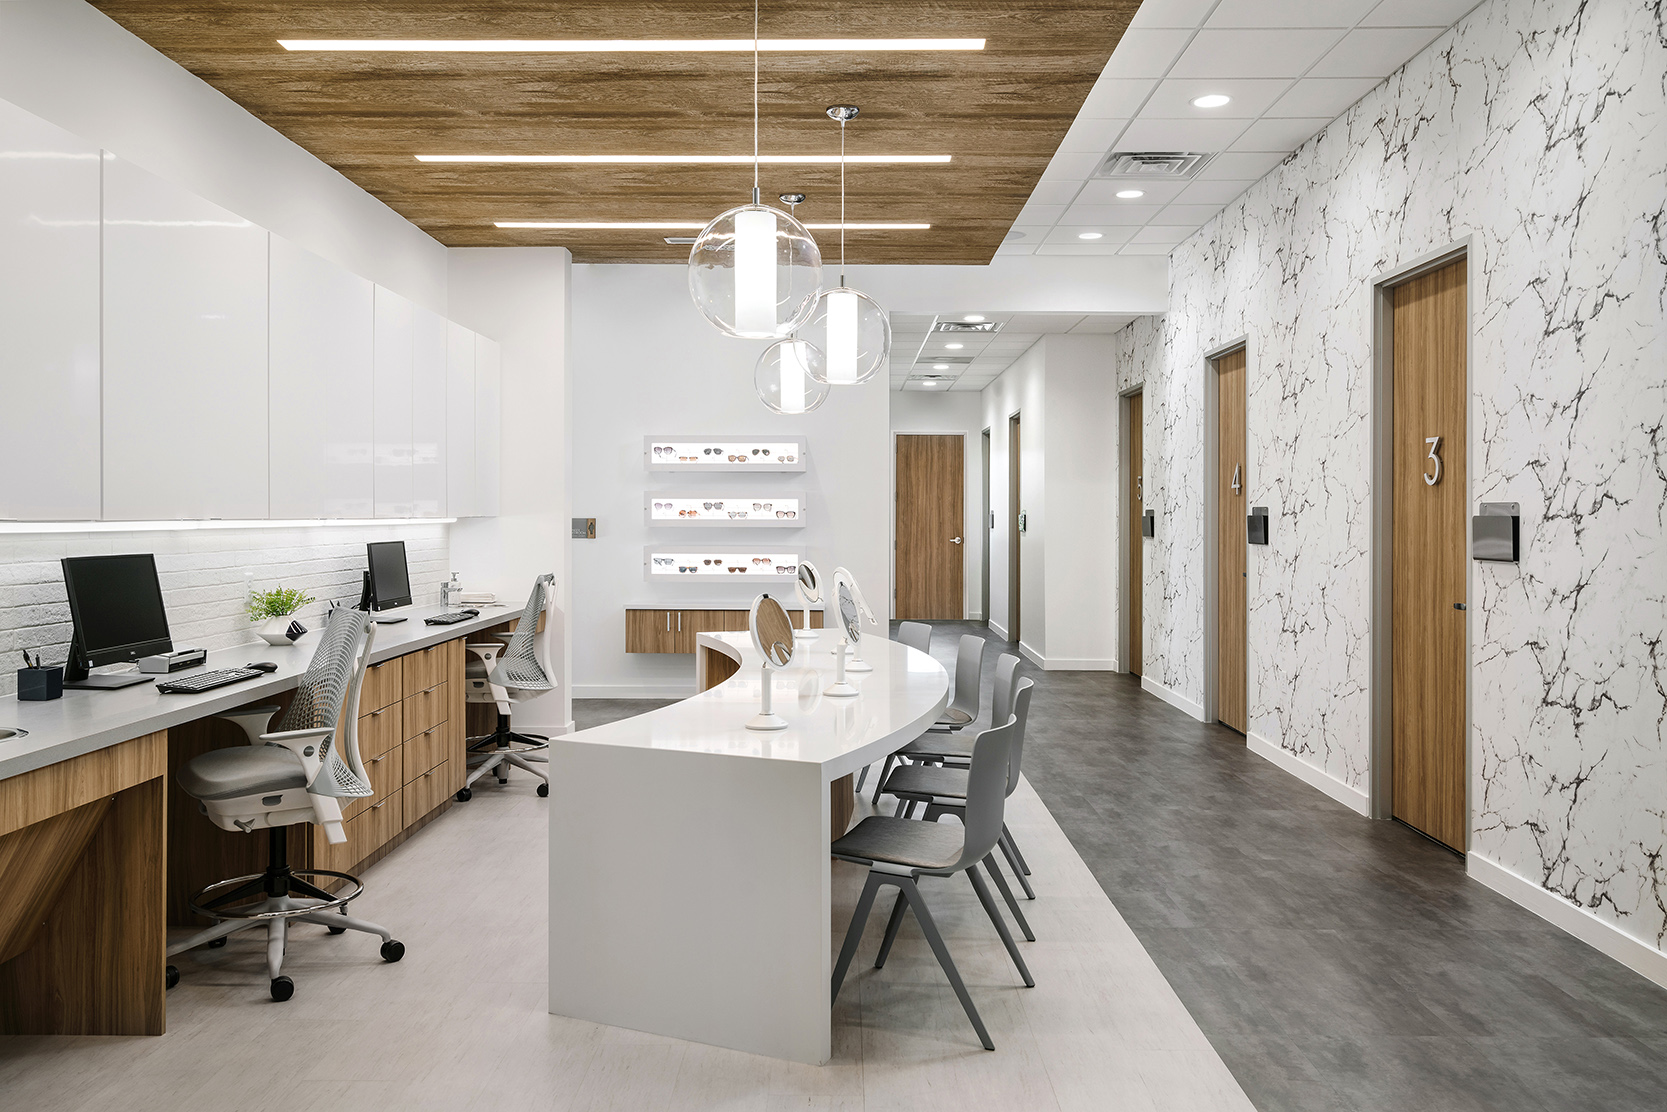 Lamm David Office Hallway